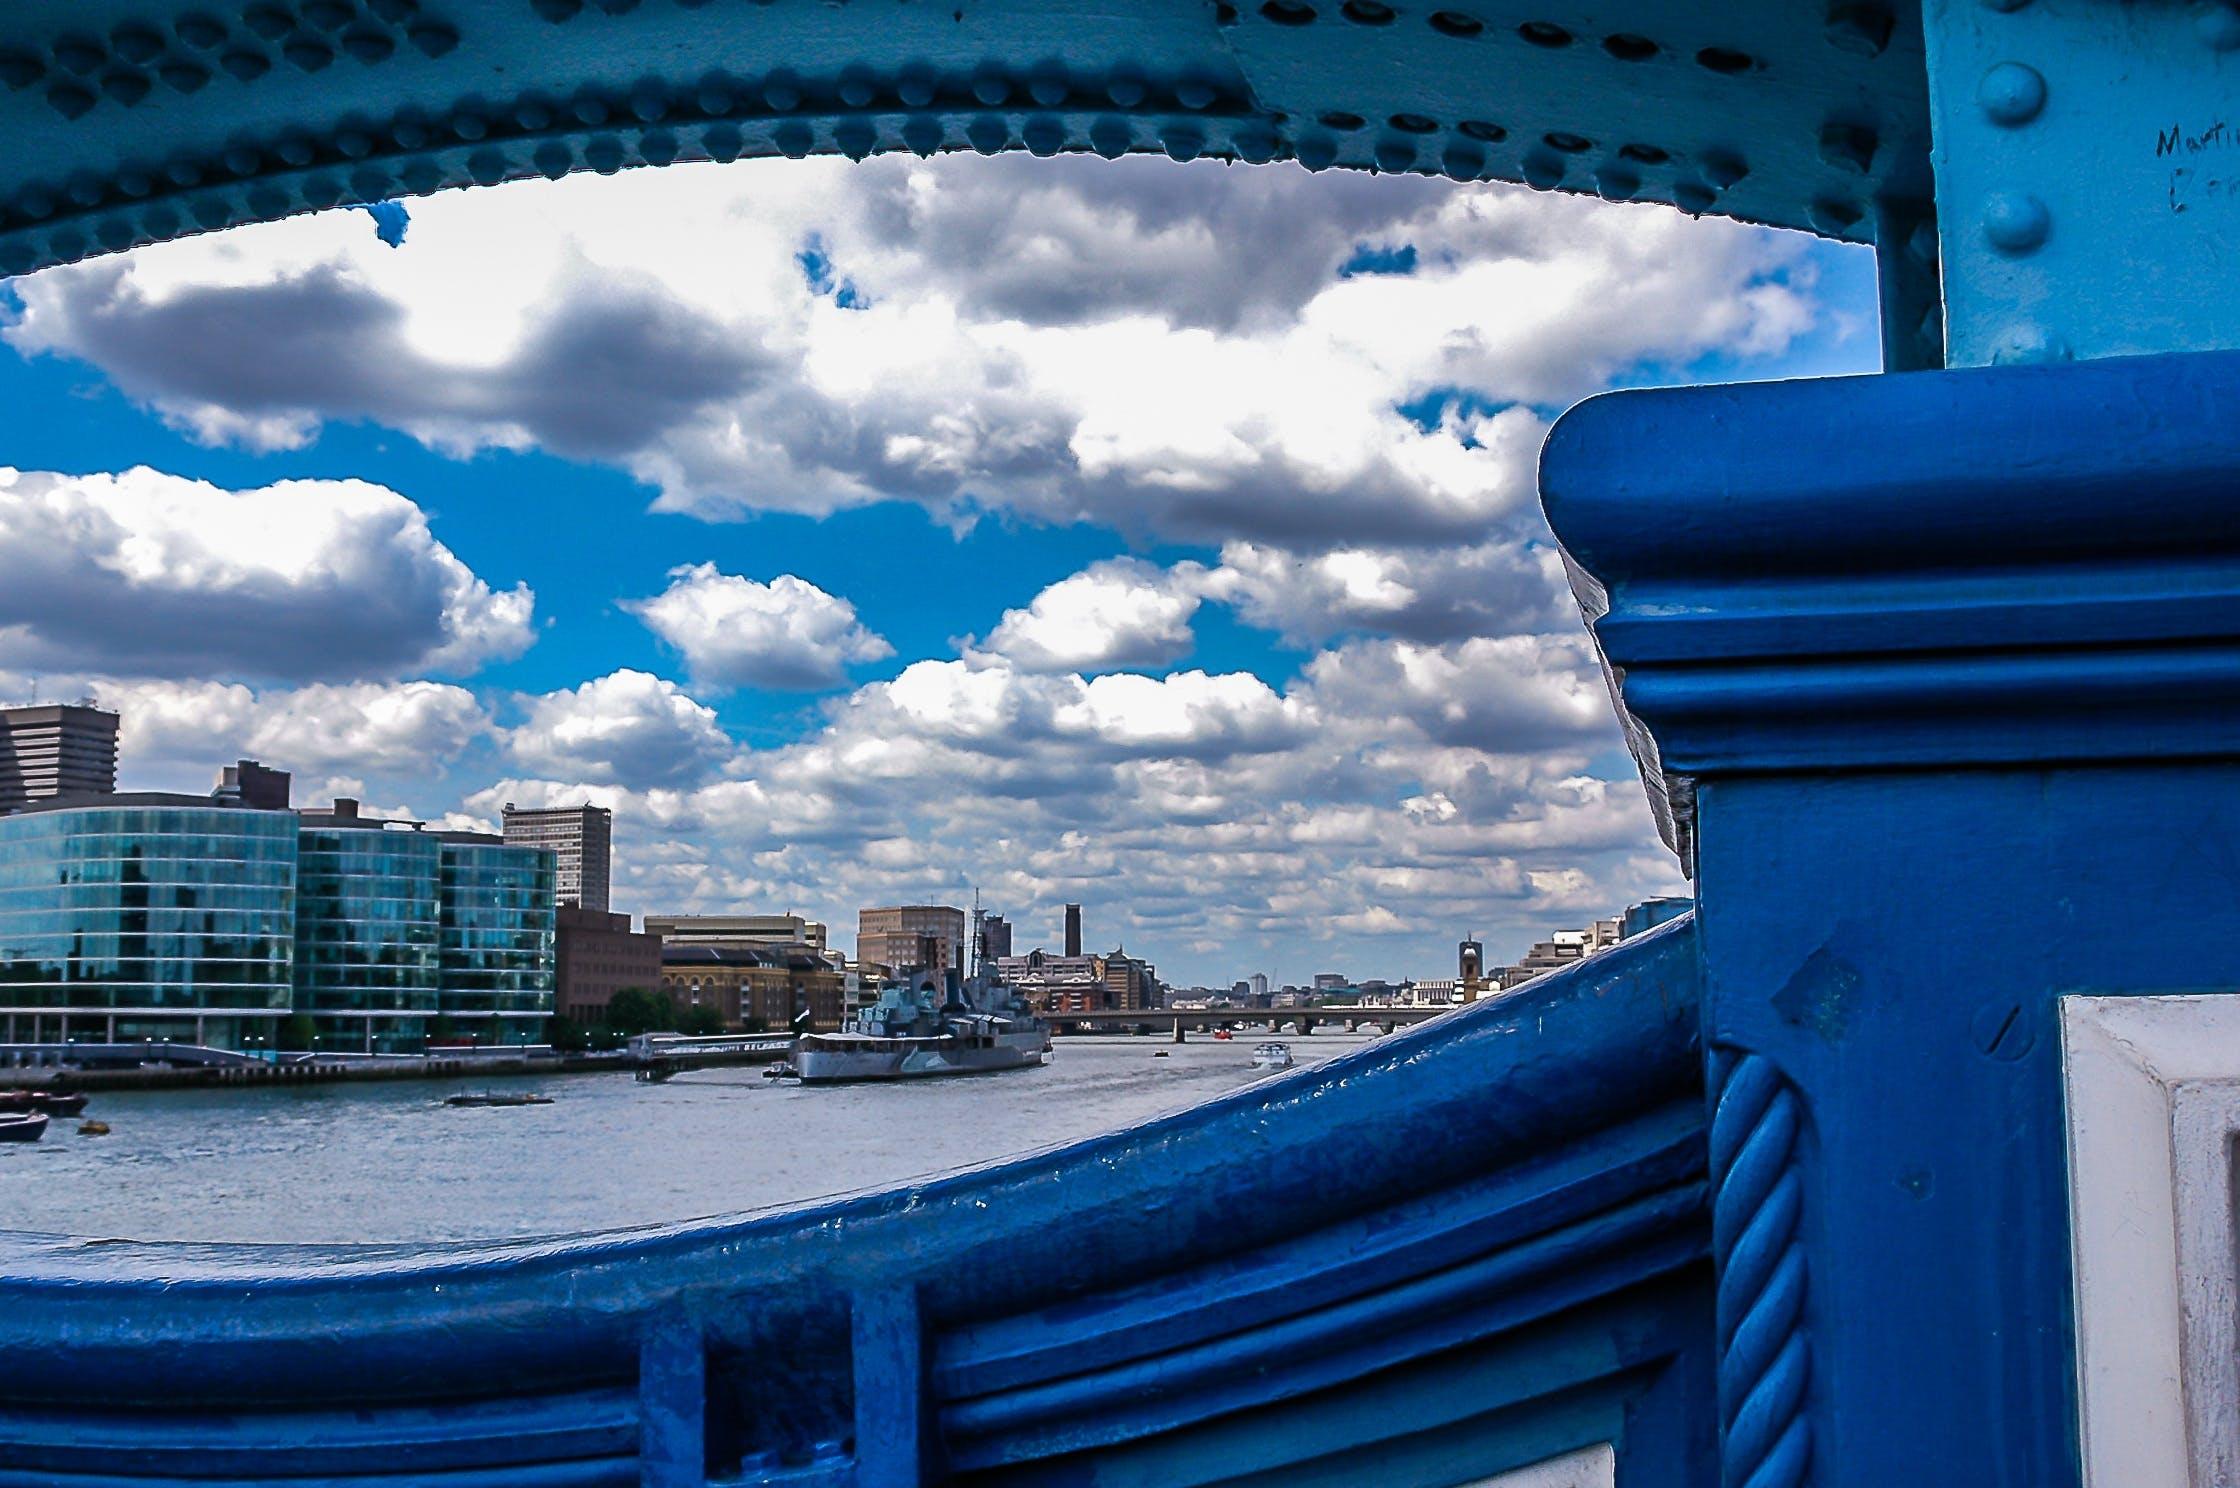 Free stock photo of city, sky, landmark, clouds